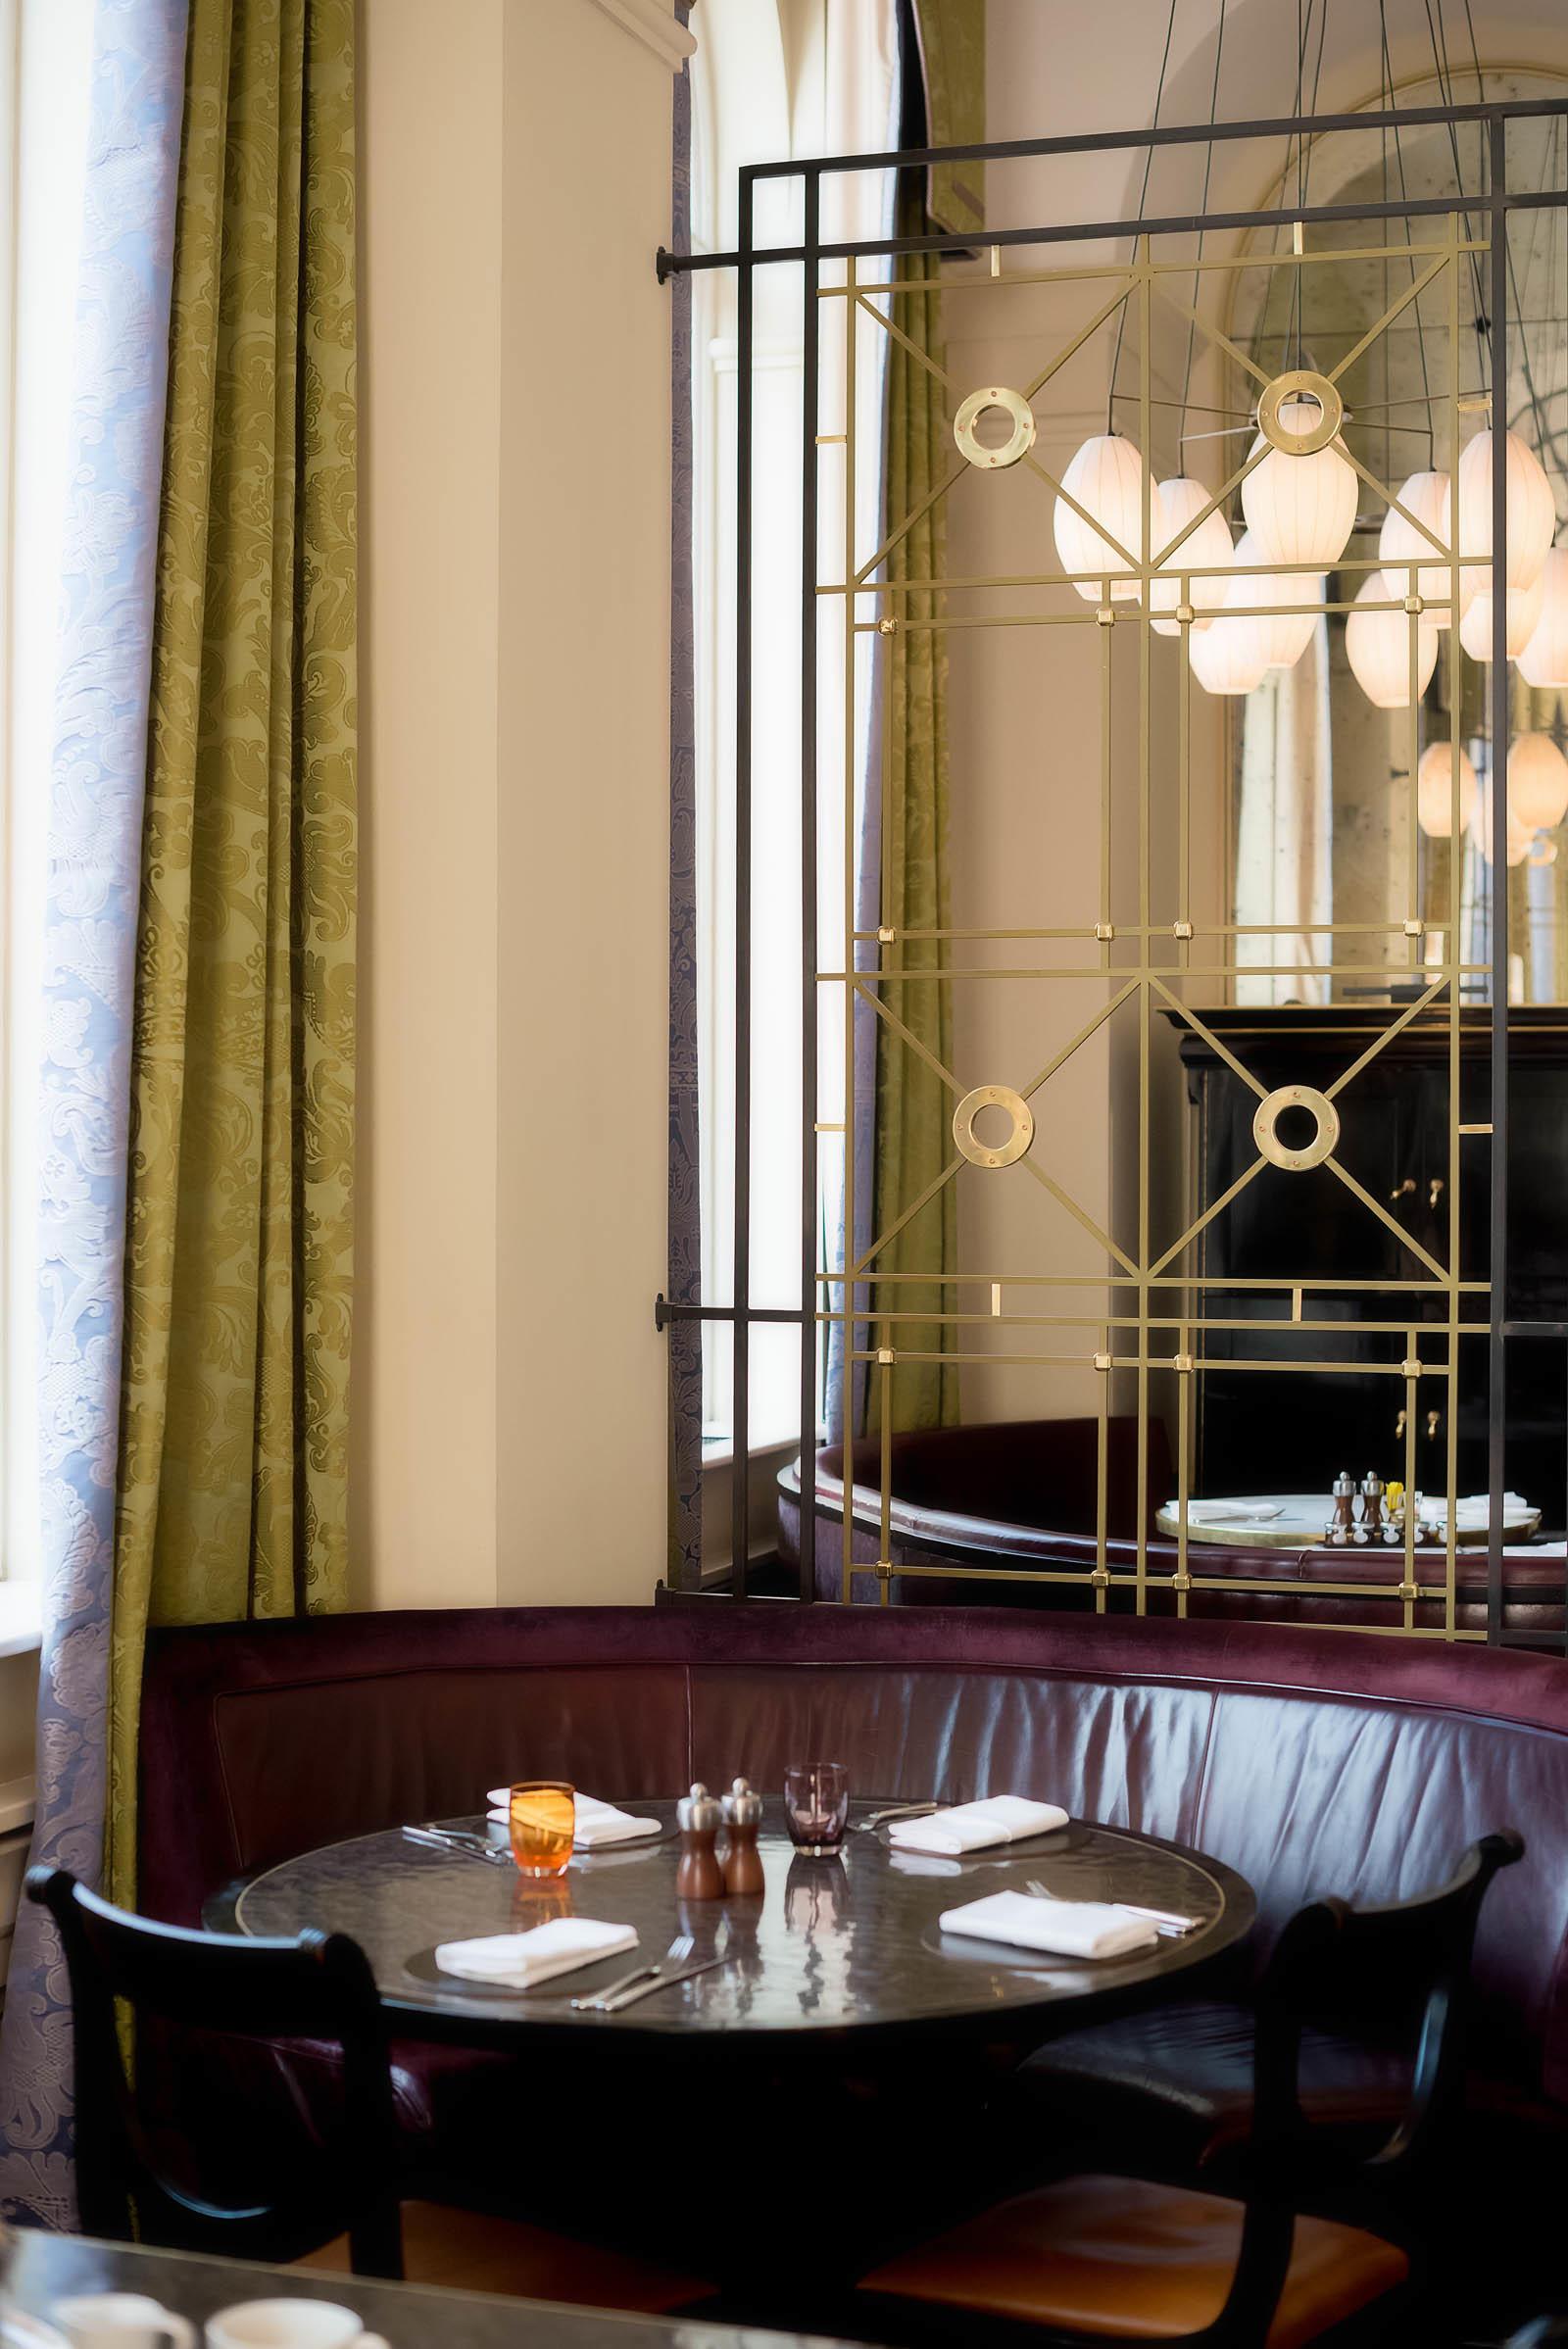 Sofitel St. James Hotel Balcon Restaurant